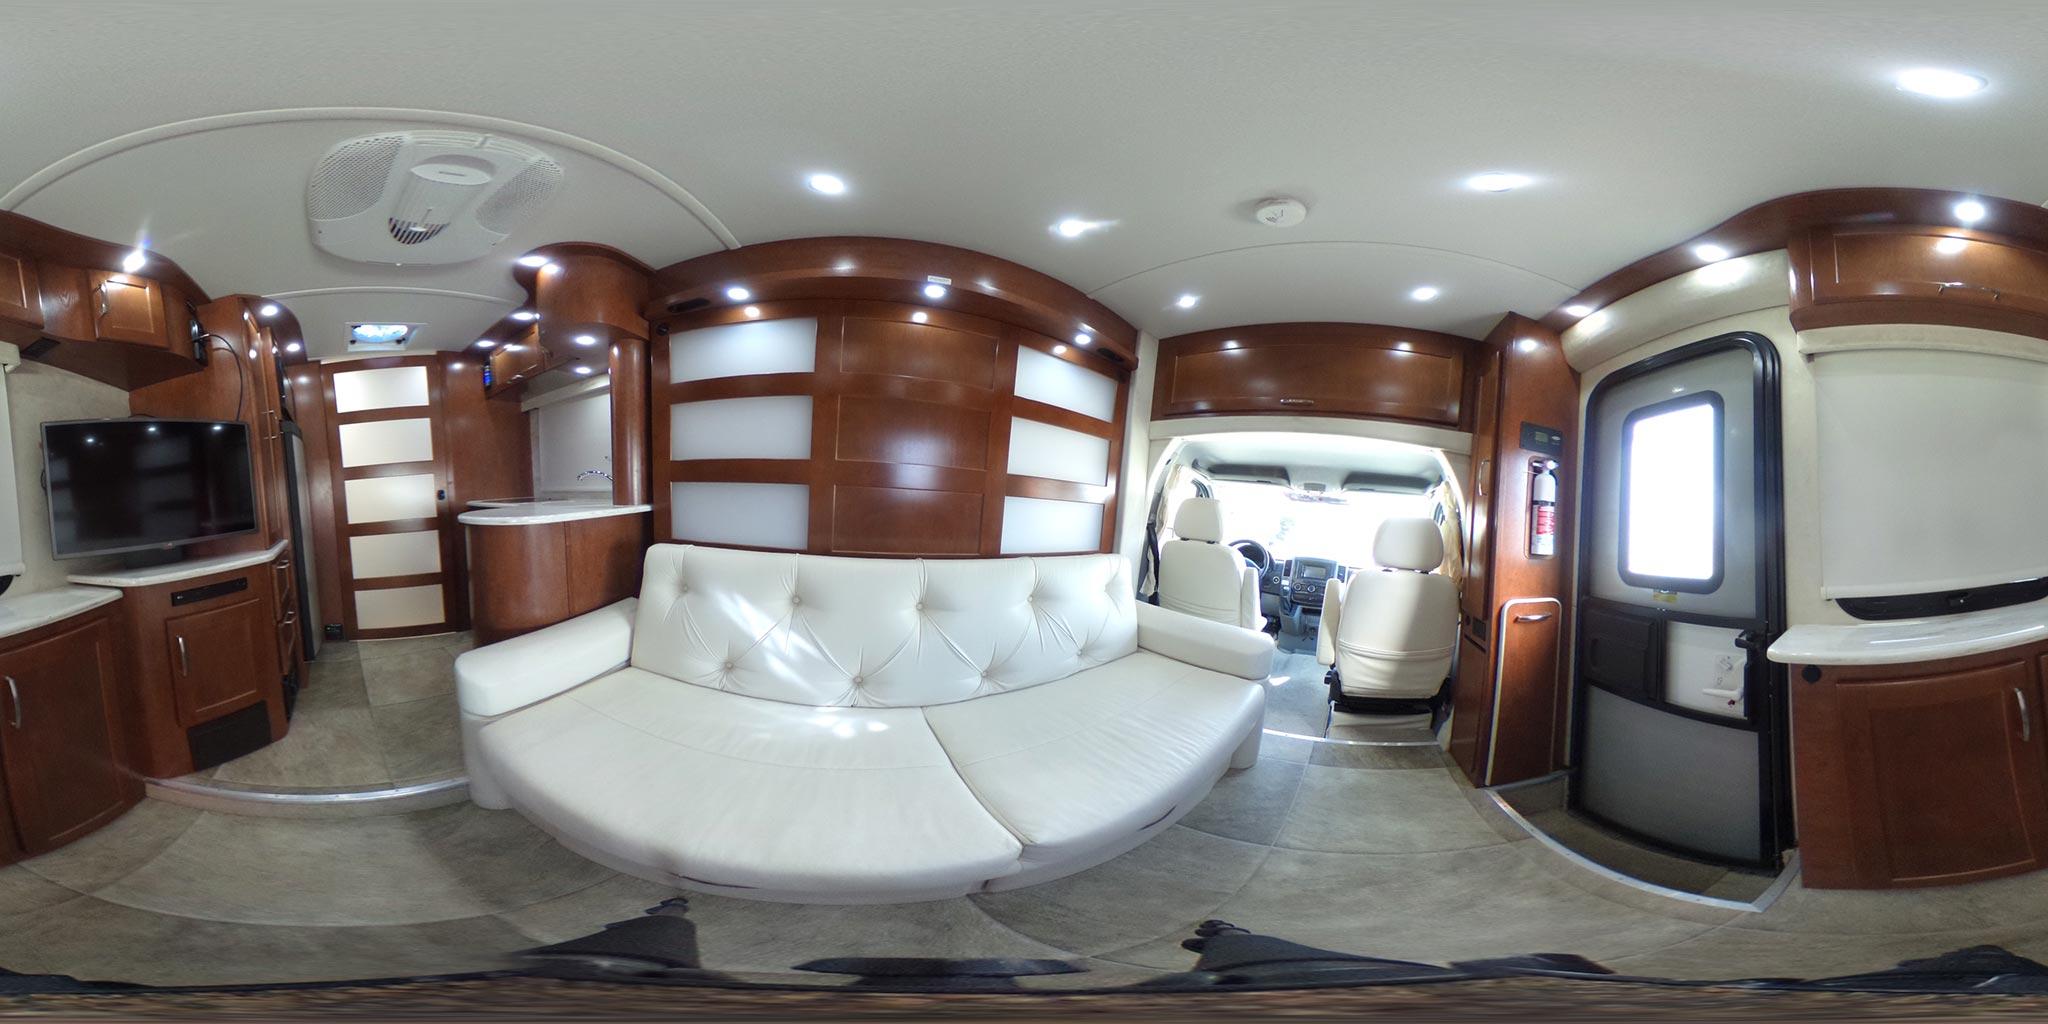 Enjoyable Class B Motorhome Camper Vans Home Interior And Landscaping Ponolsignezvosmurscom